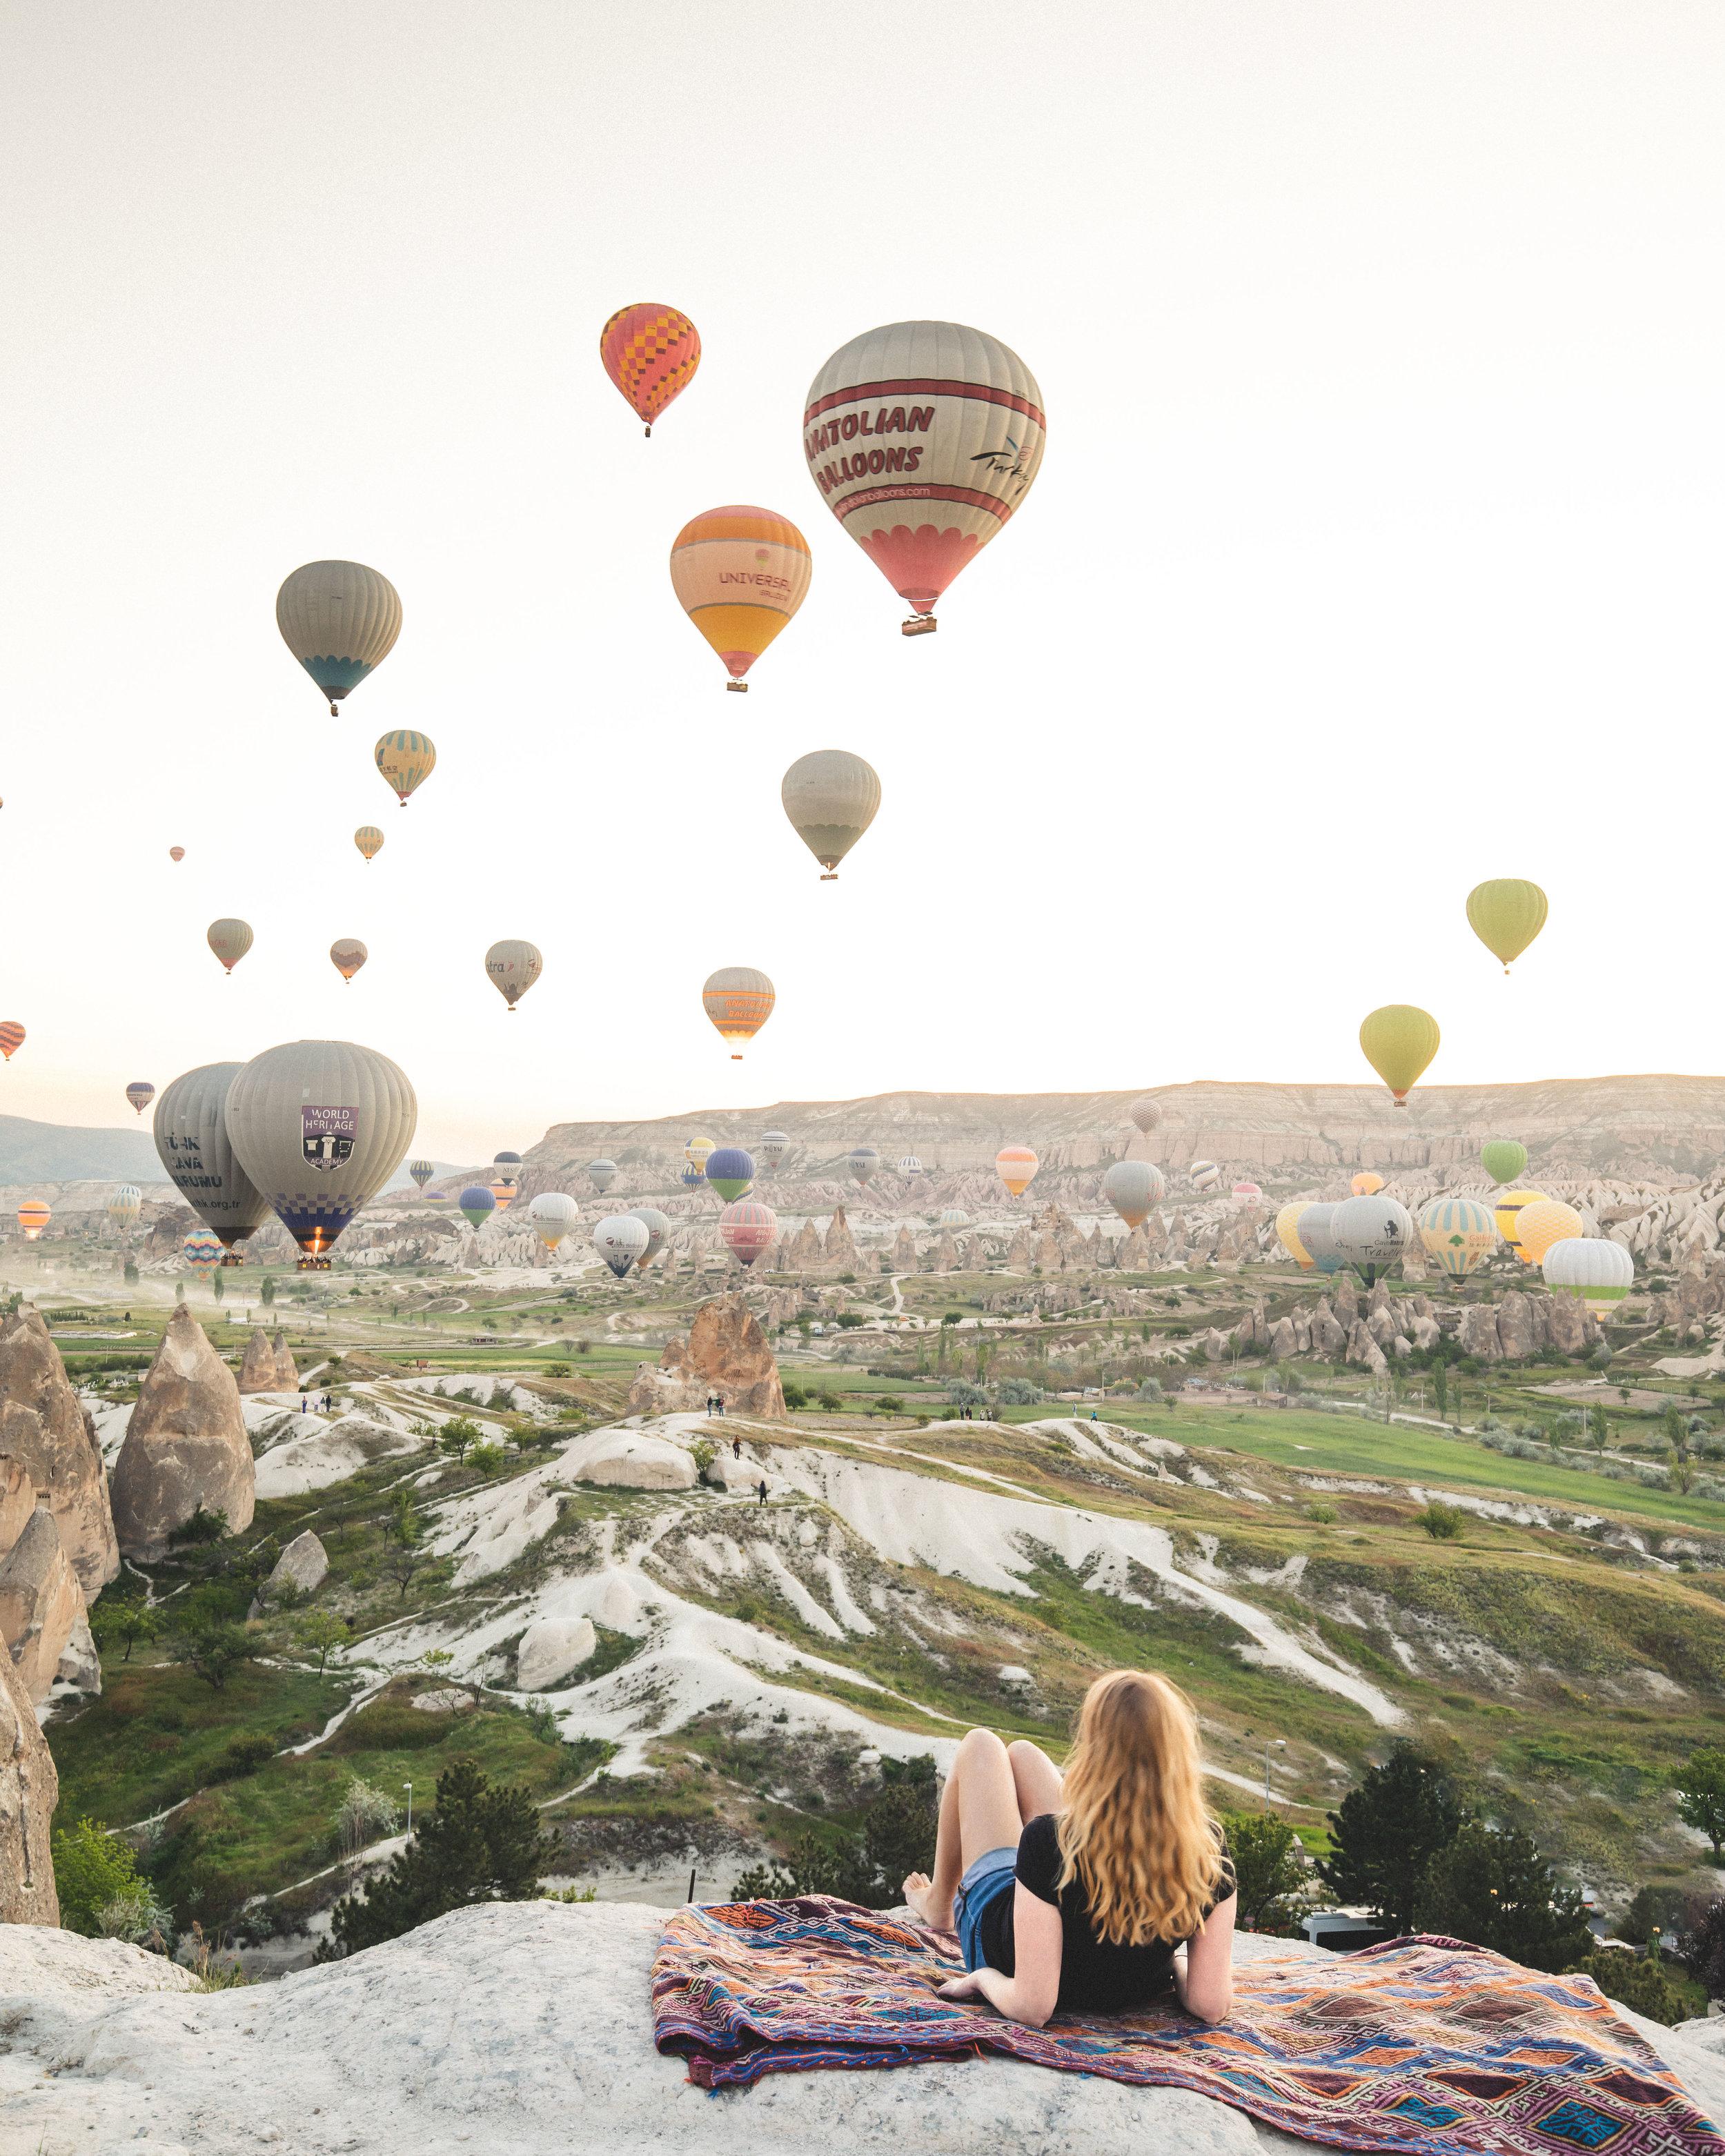 Best photo spots in Turkey - Sunset Hill in Goreme